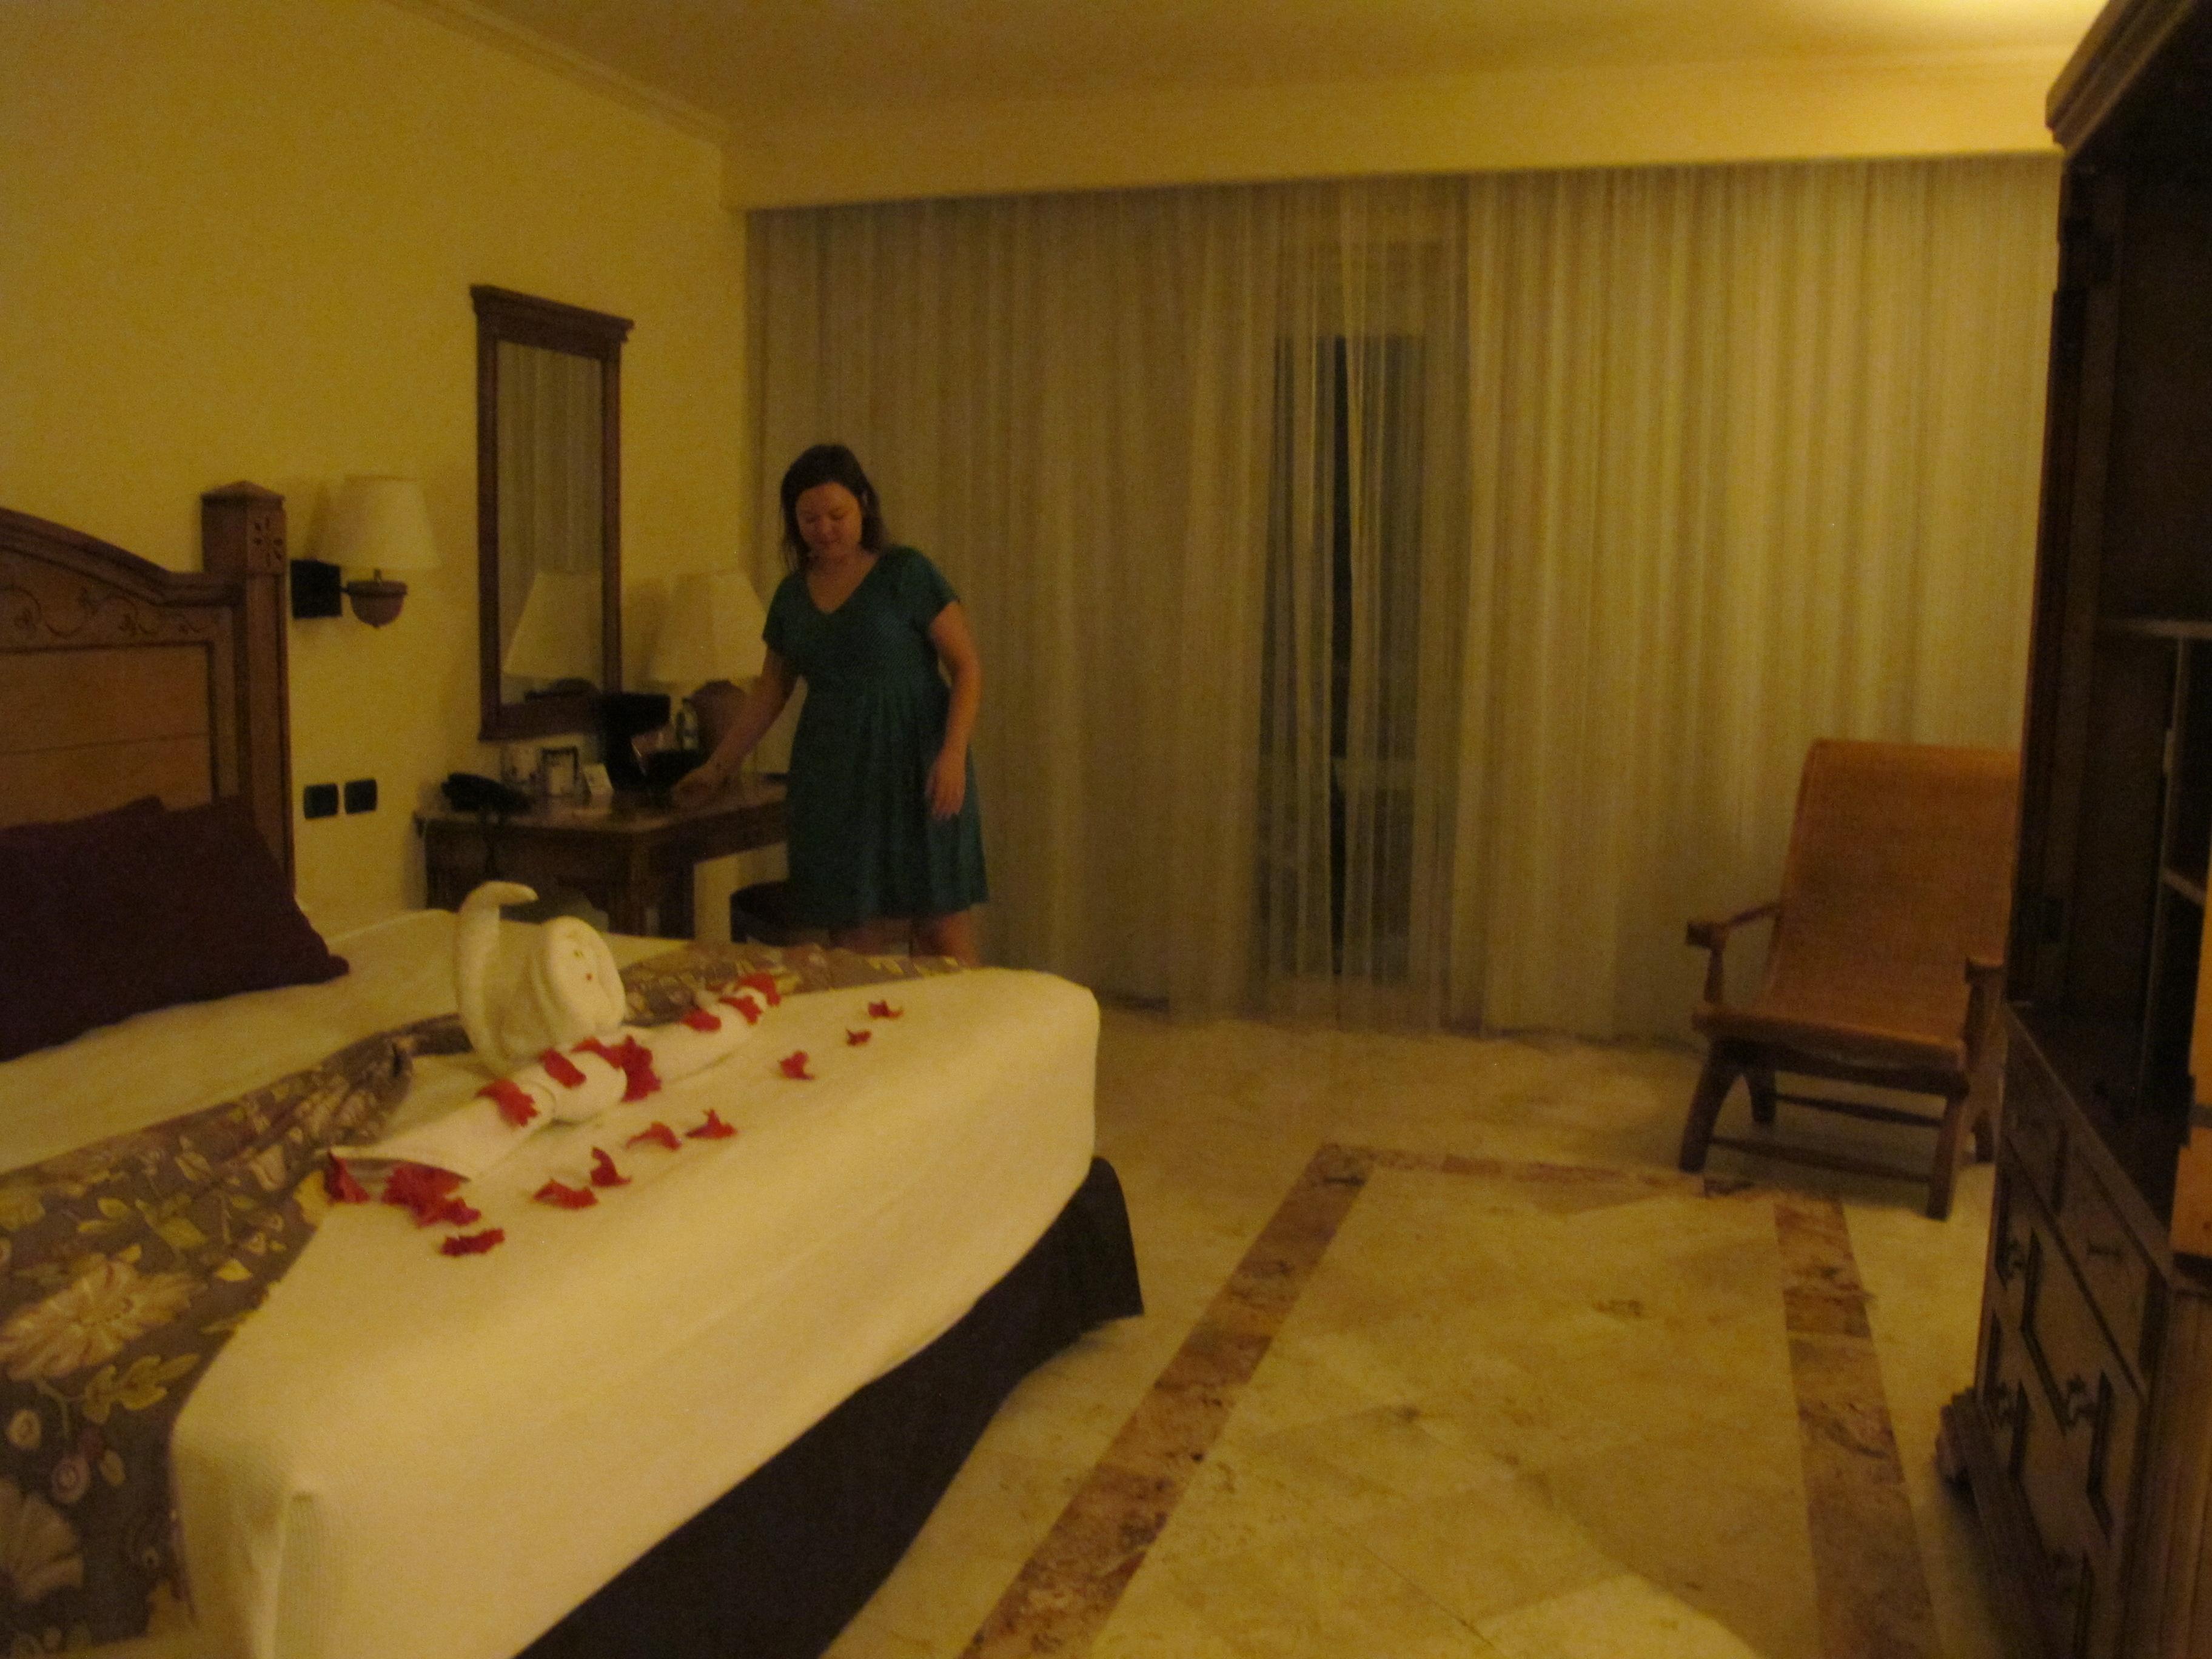 Tr riviera maya pt 2 catalonia royal tulum review 1 11 1 18 14 realtalkguidetoawesome - Hotel catalan puerto real ...